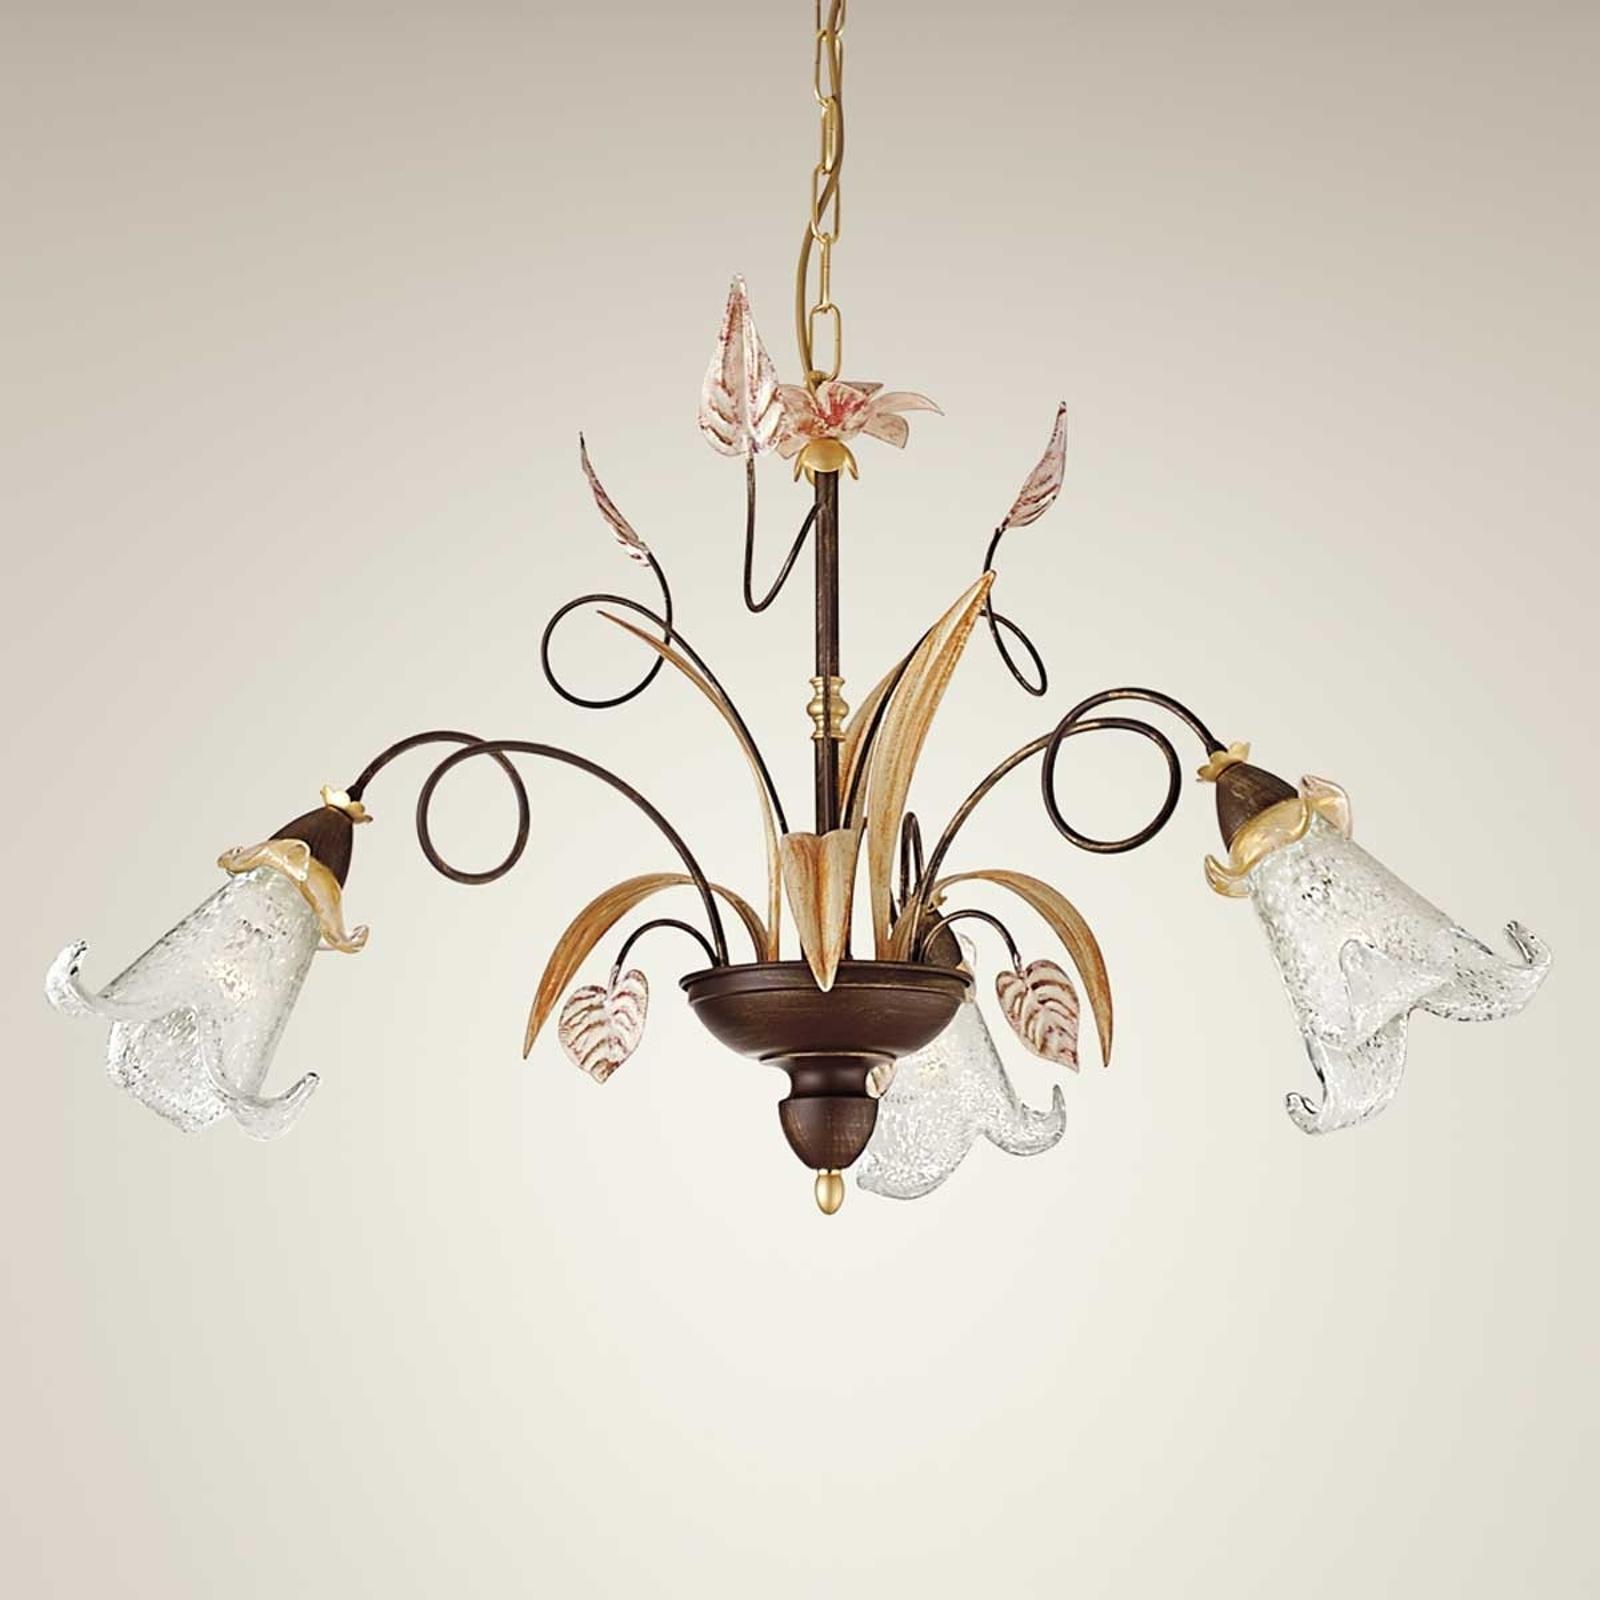 Kwiatowa lampa wisząca Giuseppe 3-punktowa